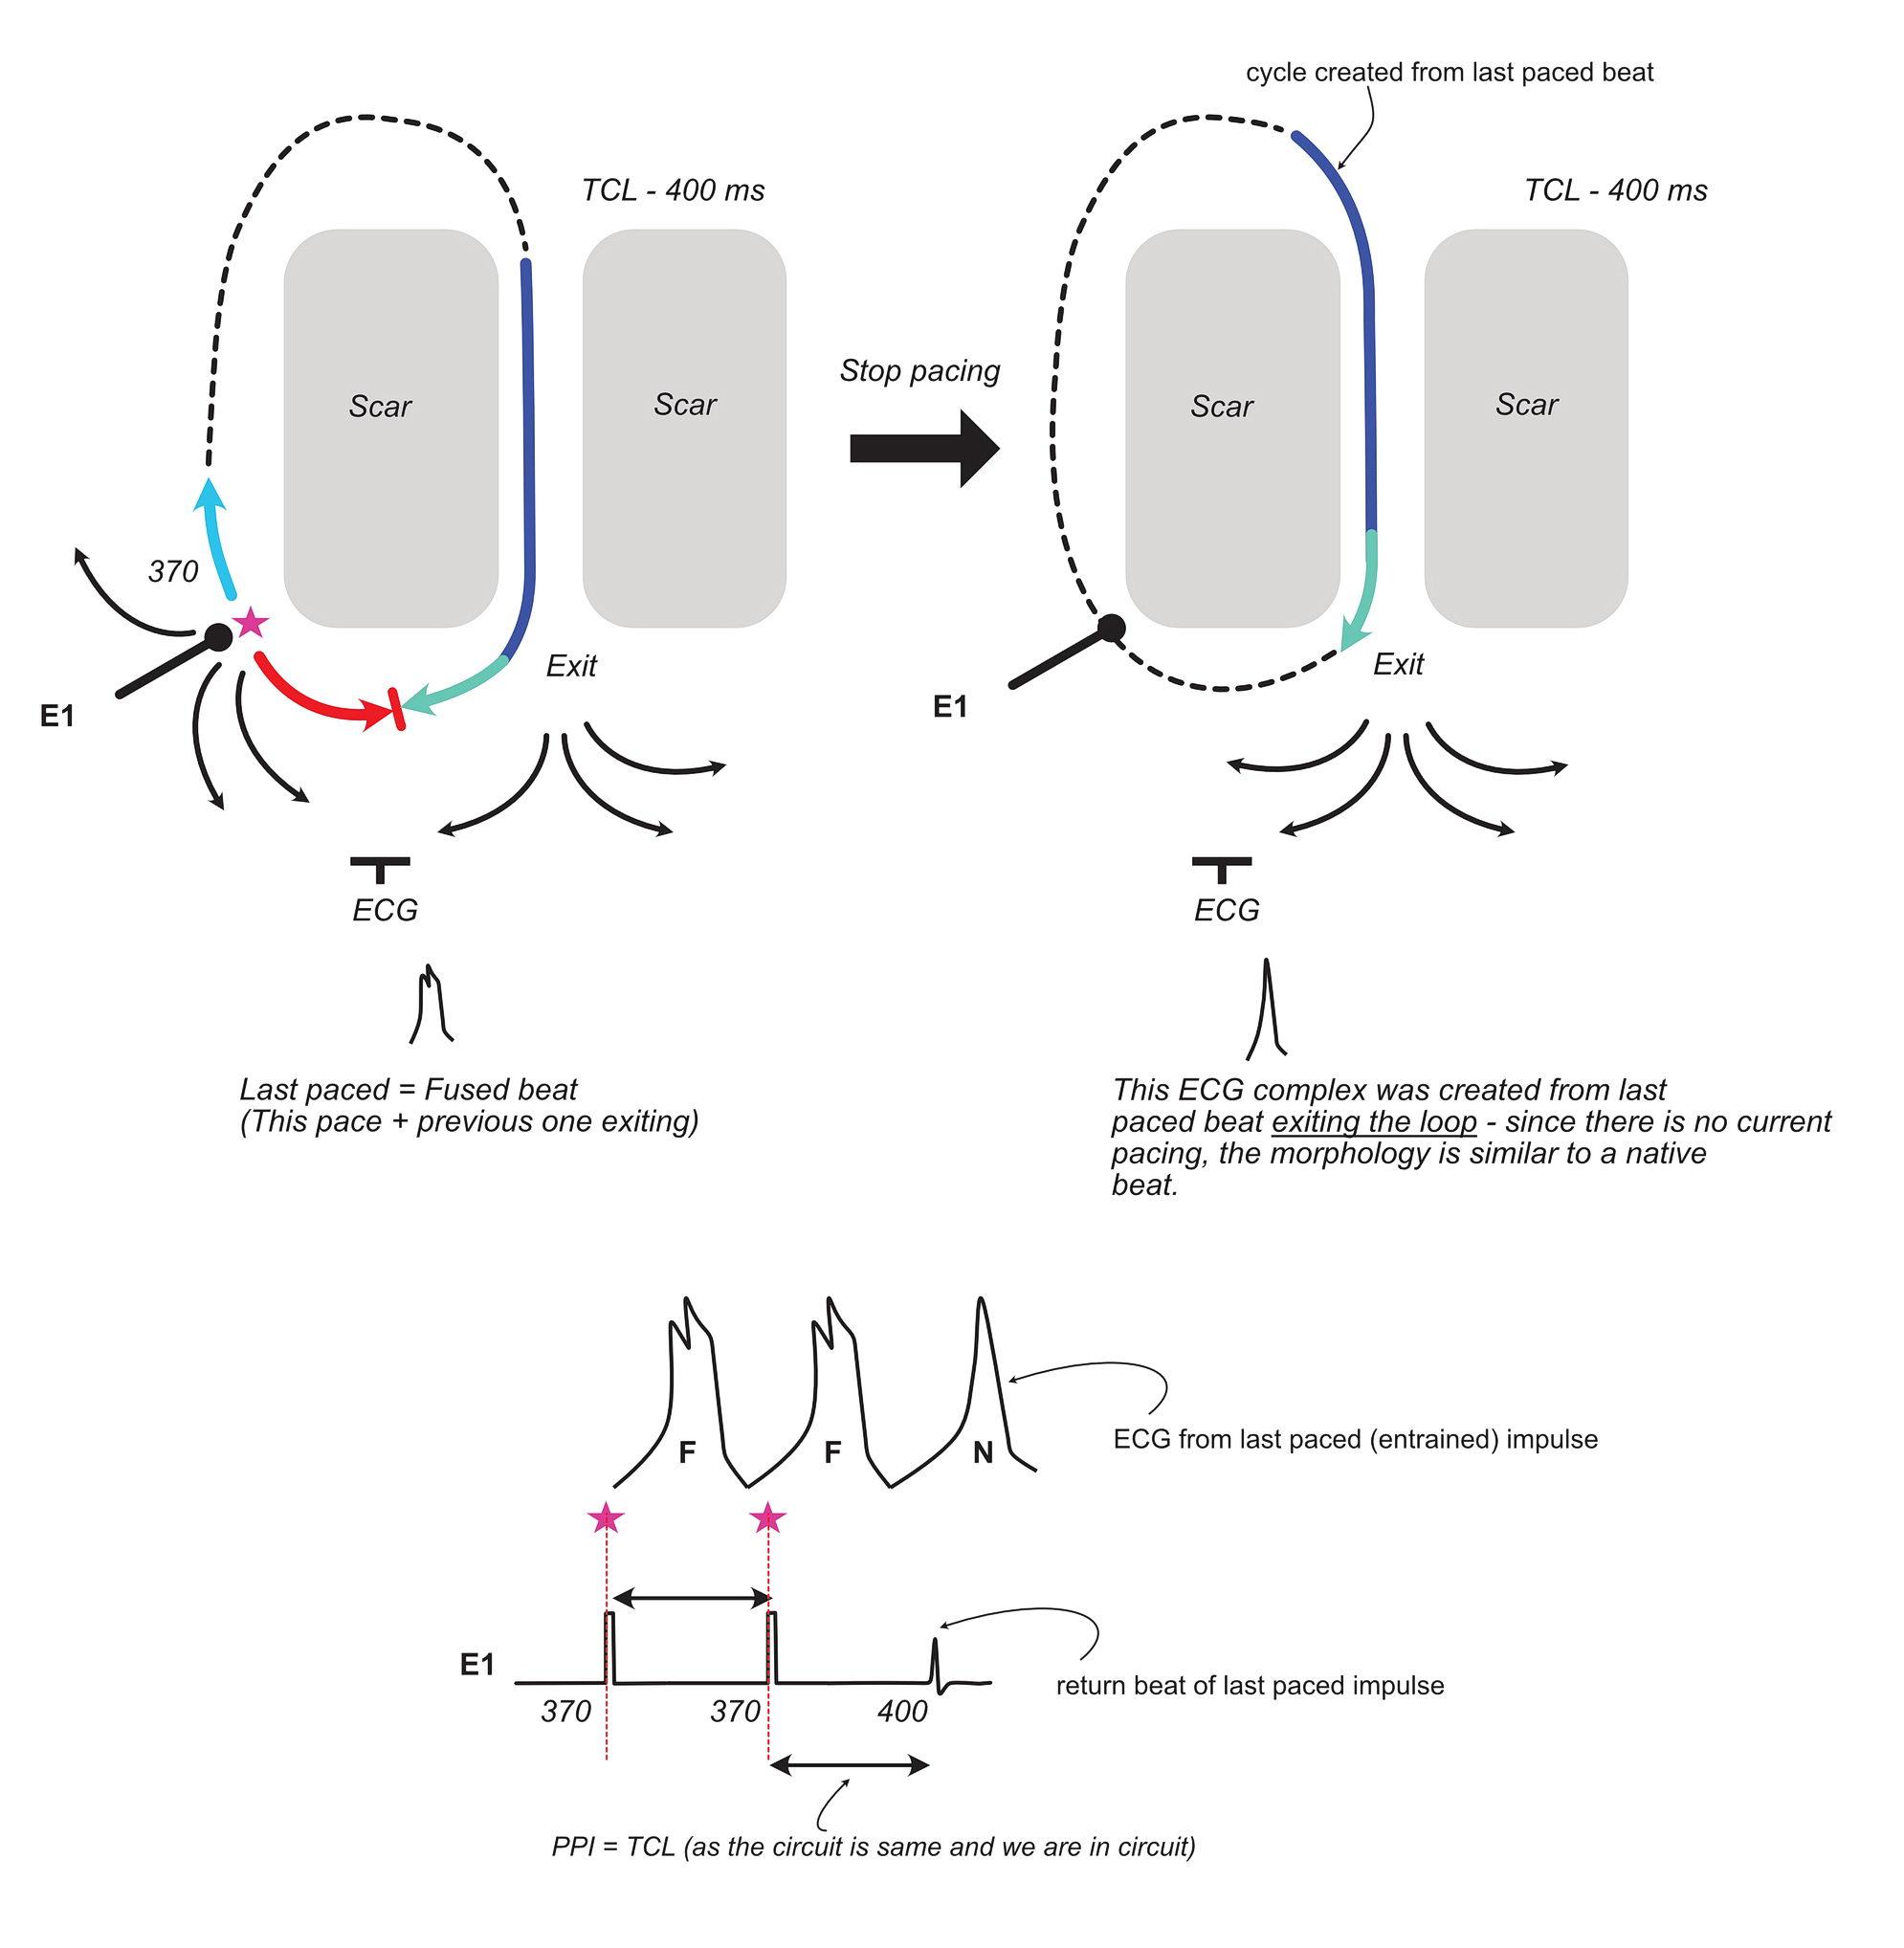 Schema on the behaviour of a re-entrant circuit after sudden cessation of entrainment